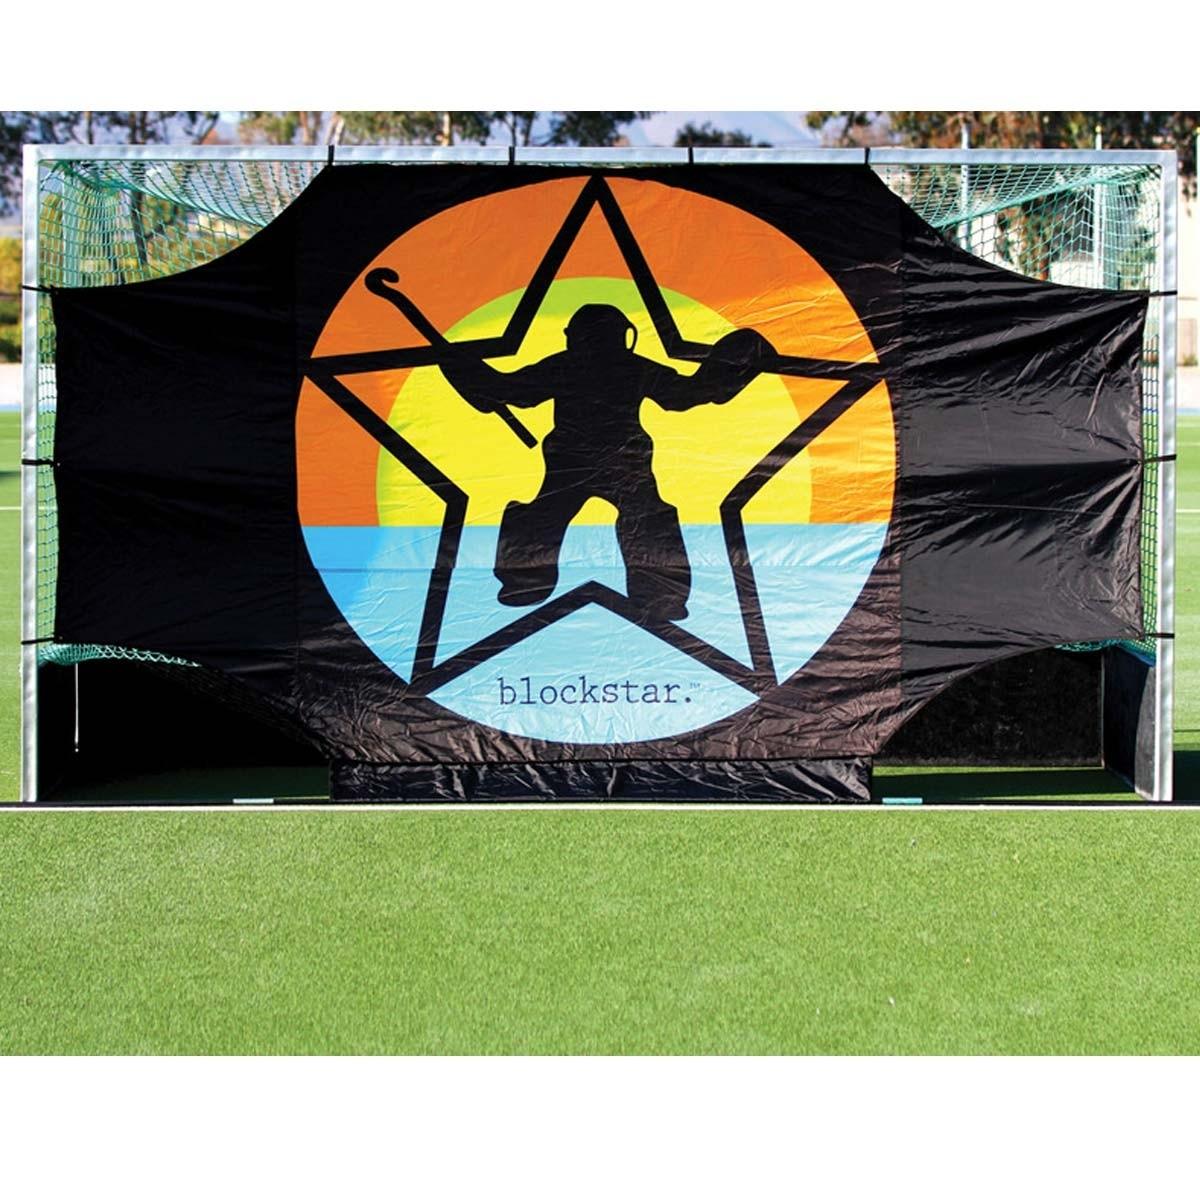 Blockstar Field Hockey Shooting Target A43 500 Anthem